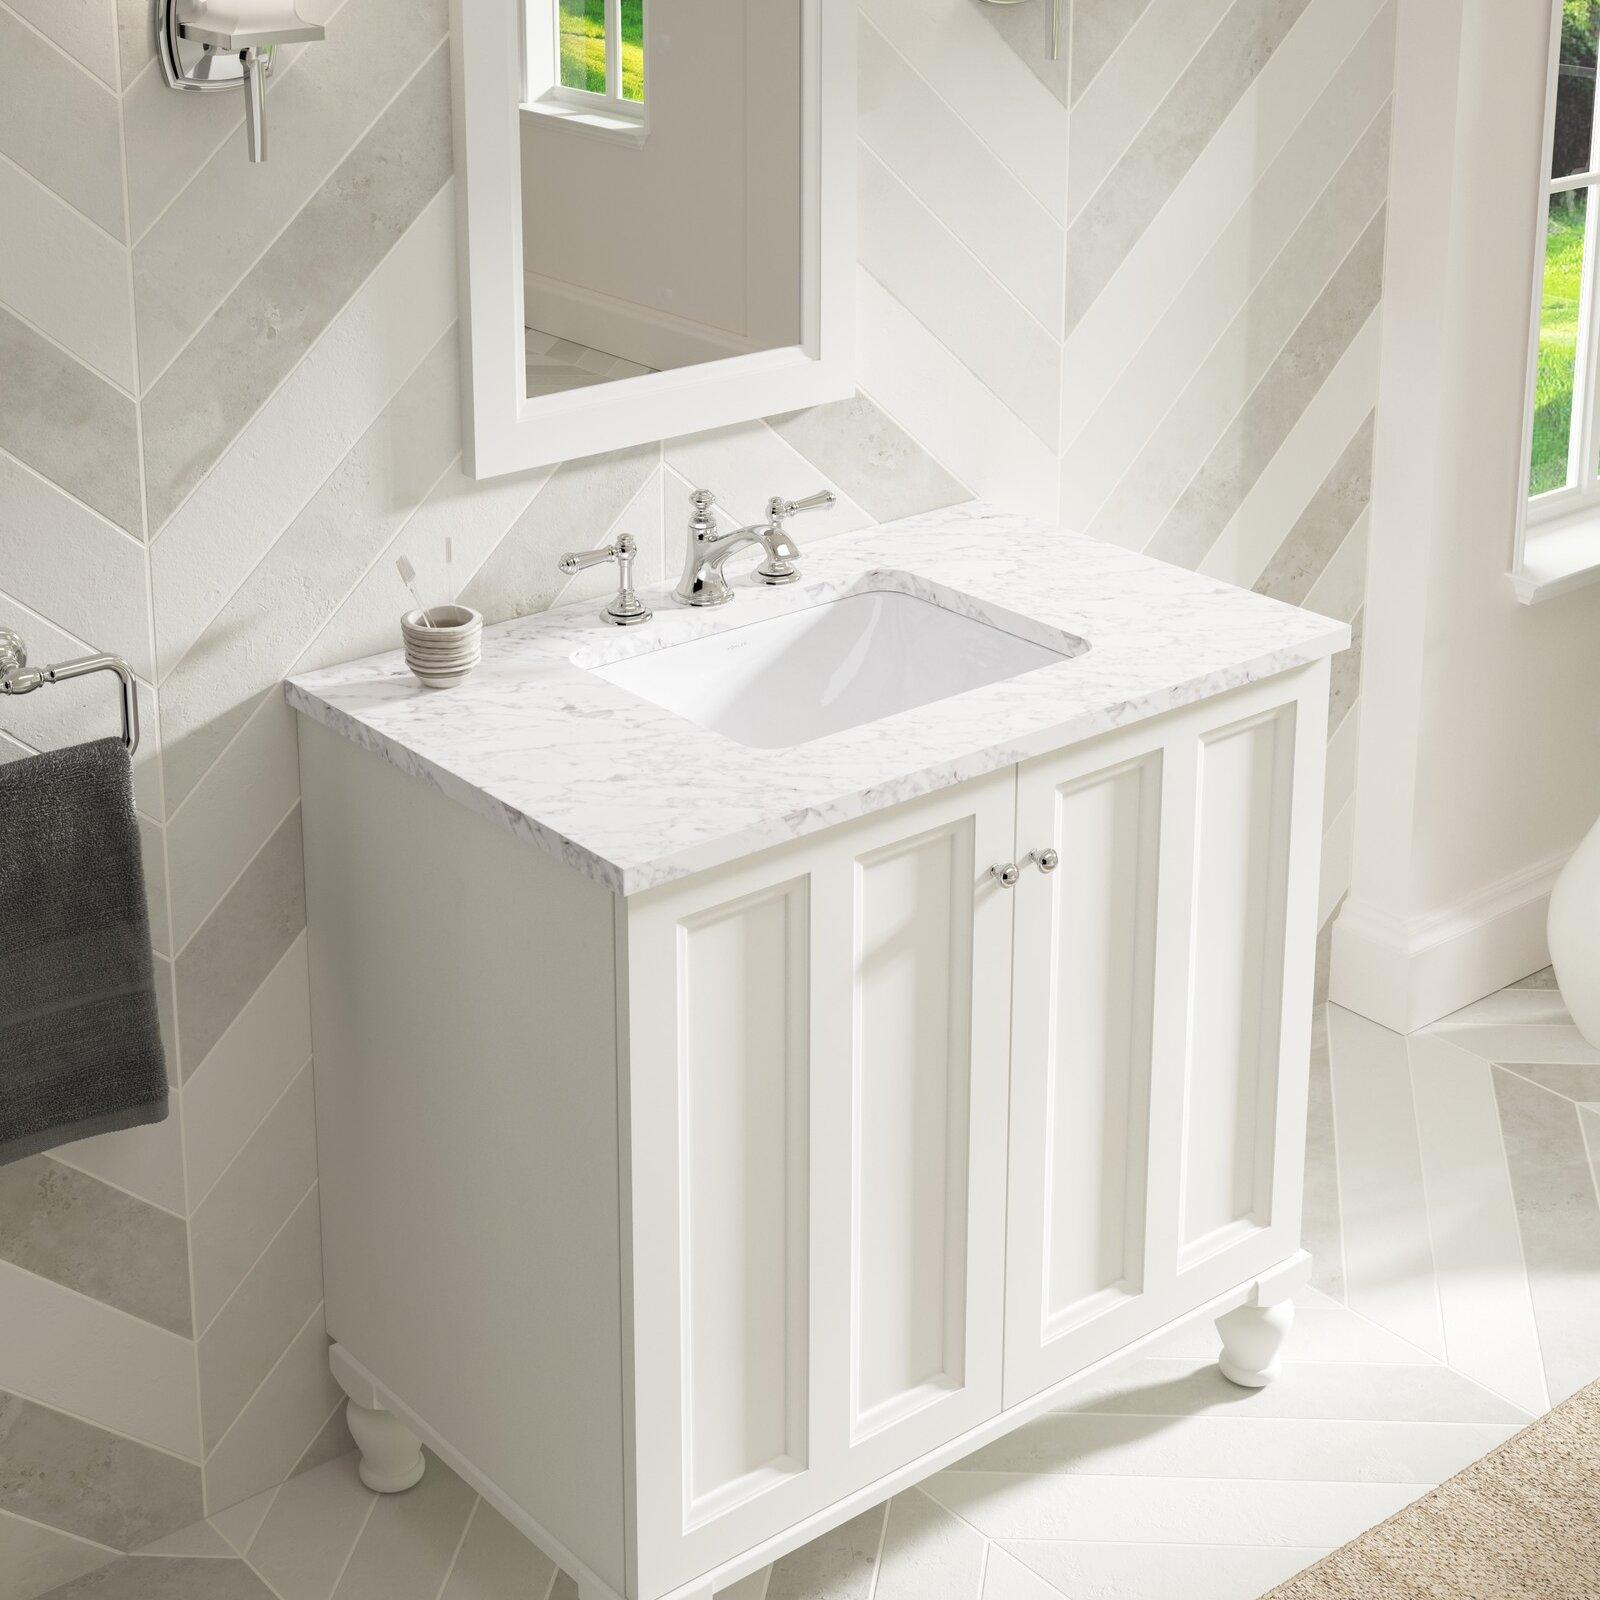 K 20000 0 96 95 Kohler Caxton Rectangle 20 1 4 Undermount Bathroom Sink With Overflow Reviews Wayfair